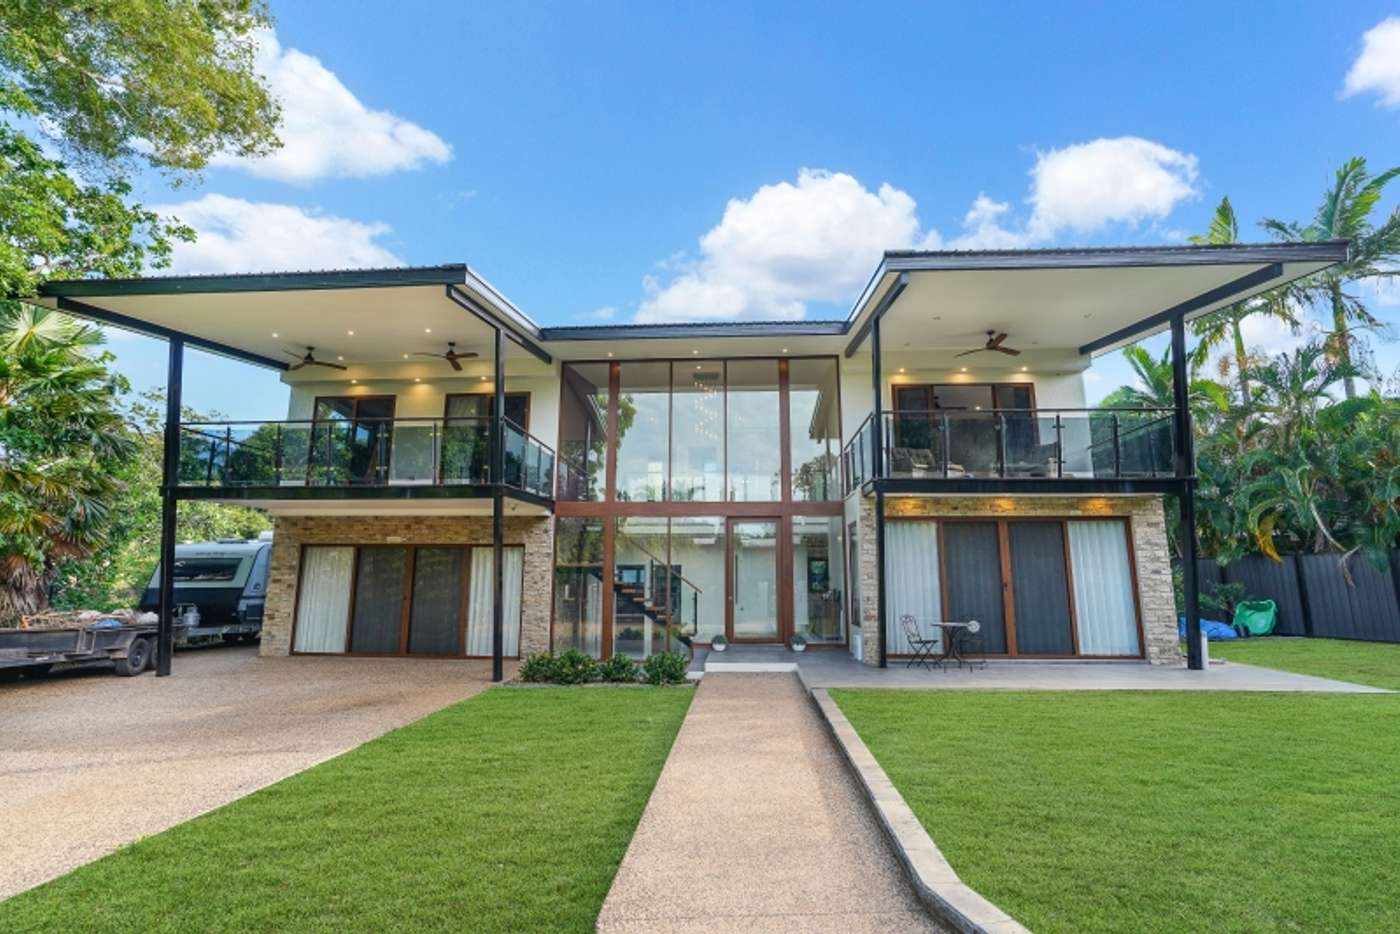 Main view of Homely house listing, 48 Chrisp Street, Rapid Creek NT 810